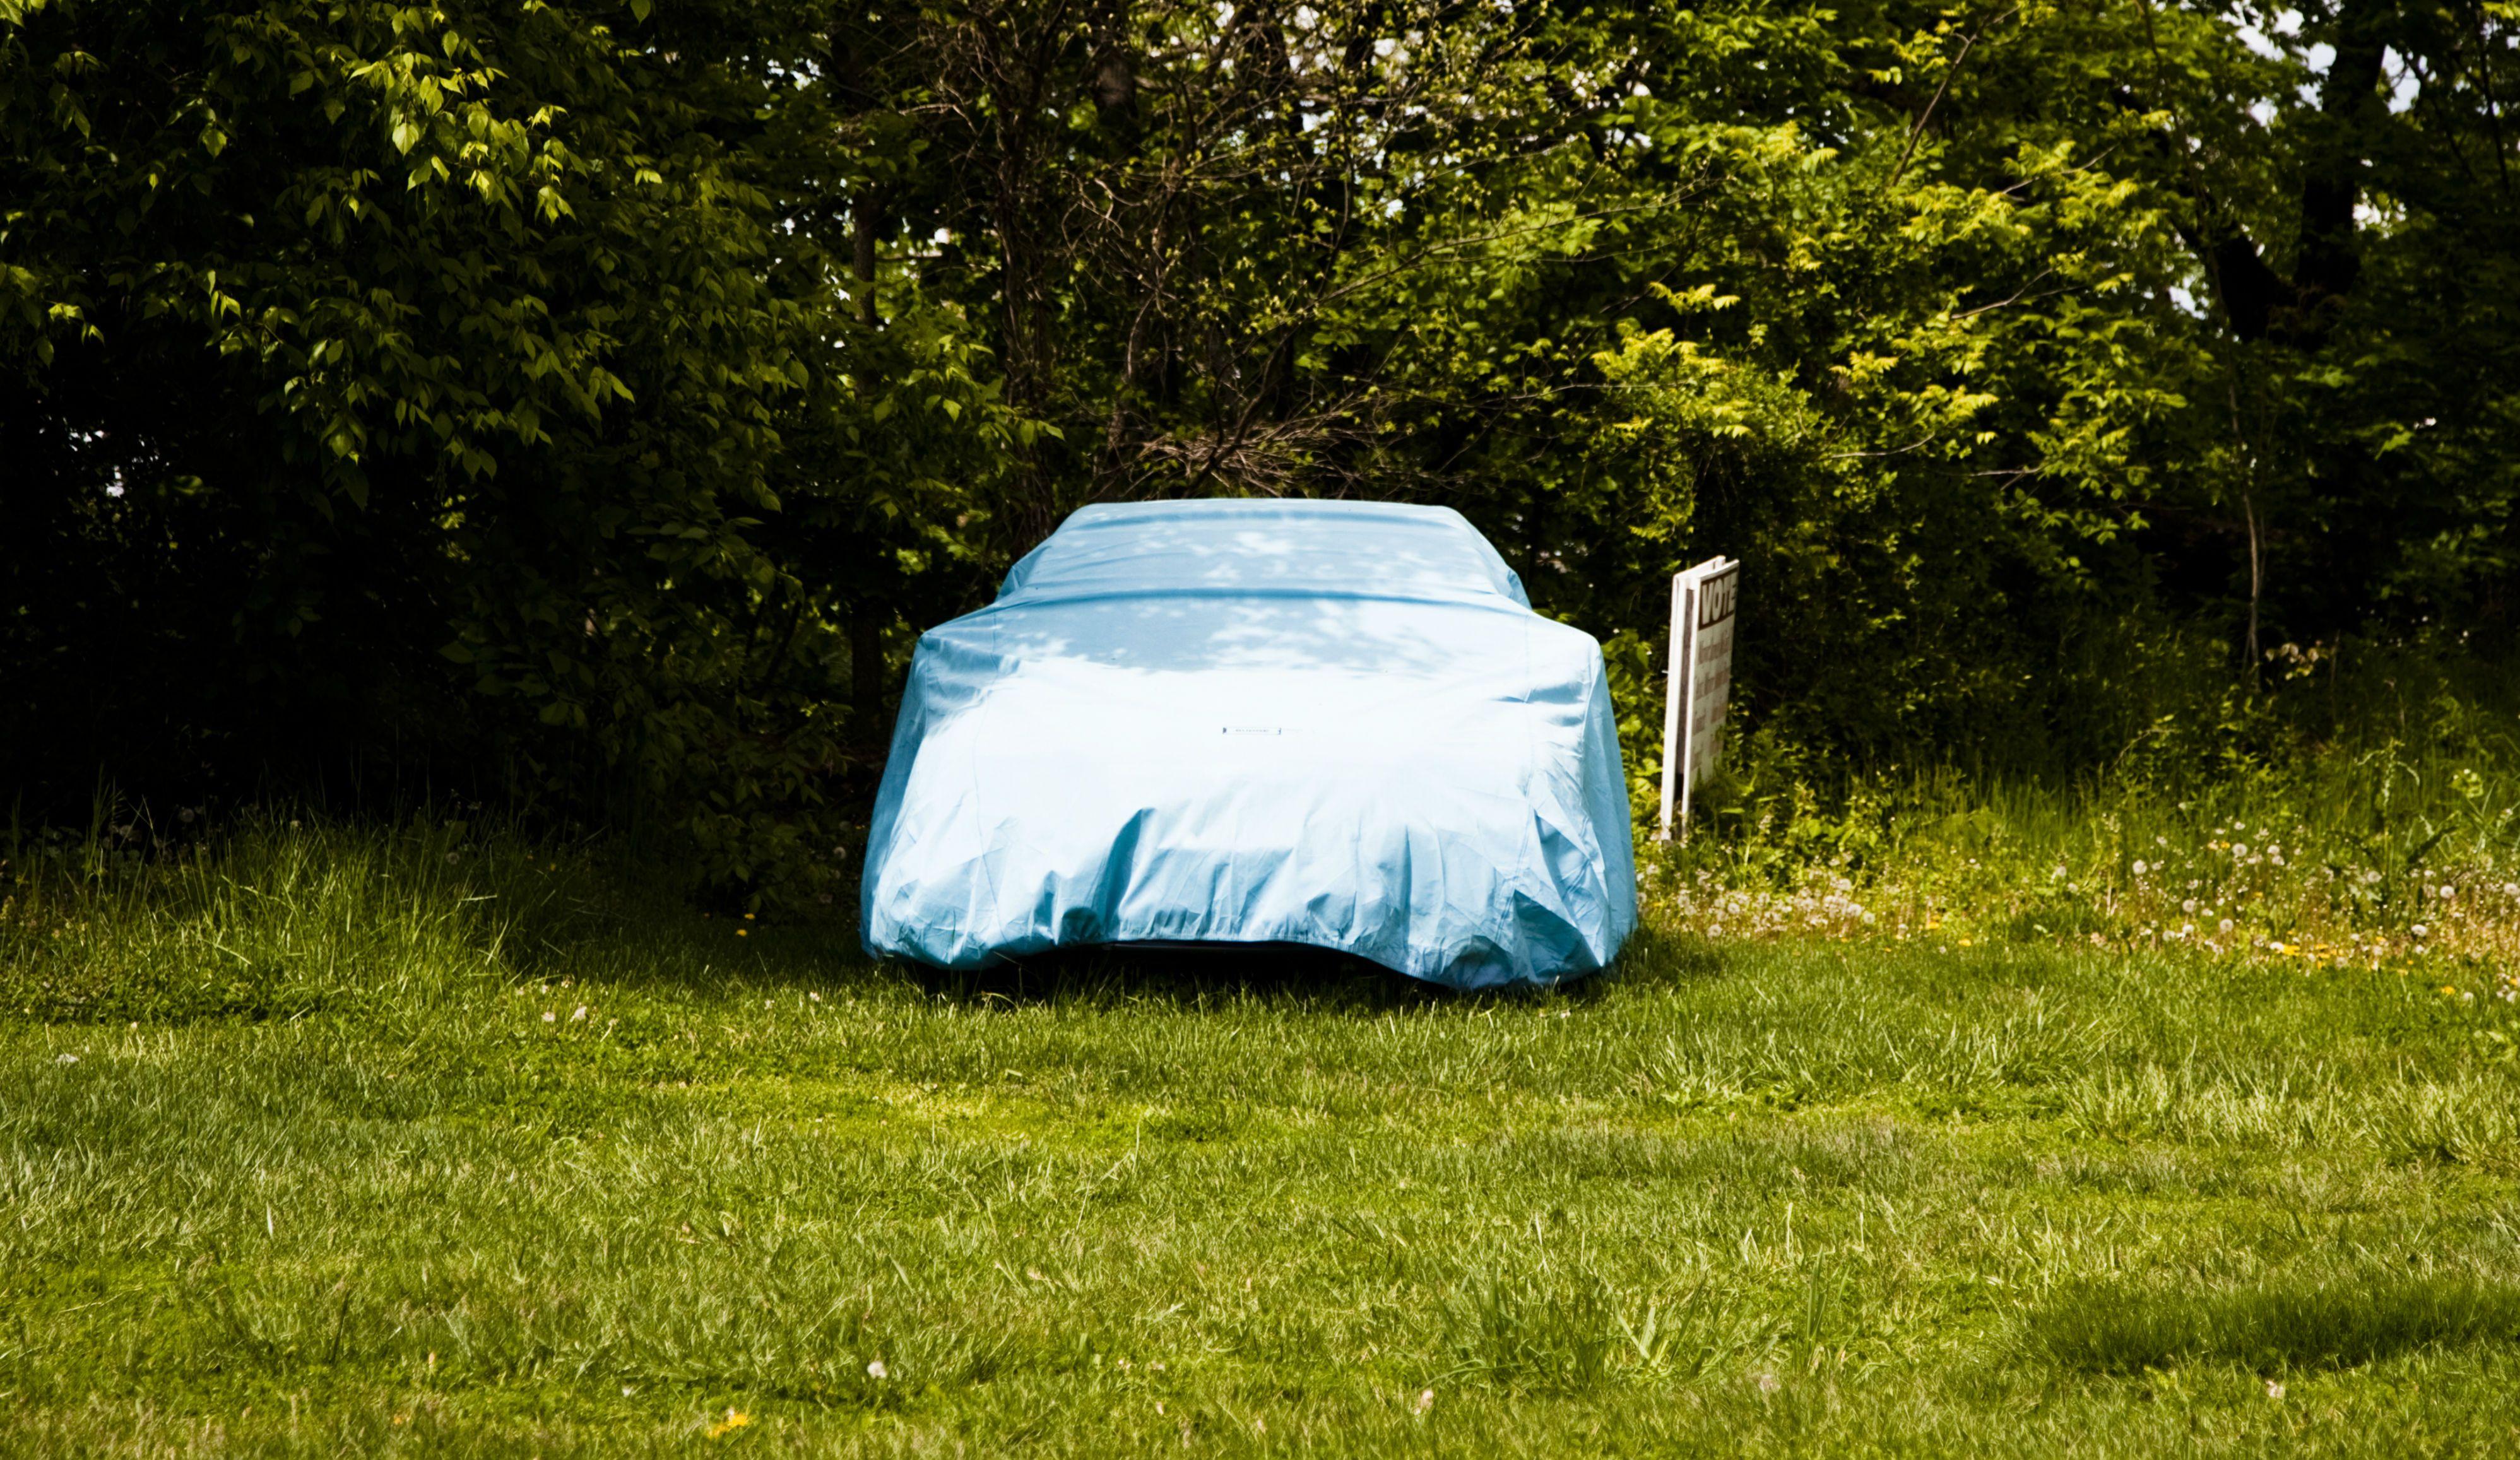 How To Resurrect a Sleeping Car